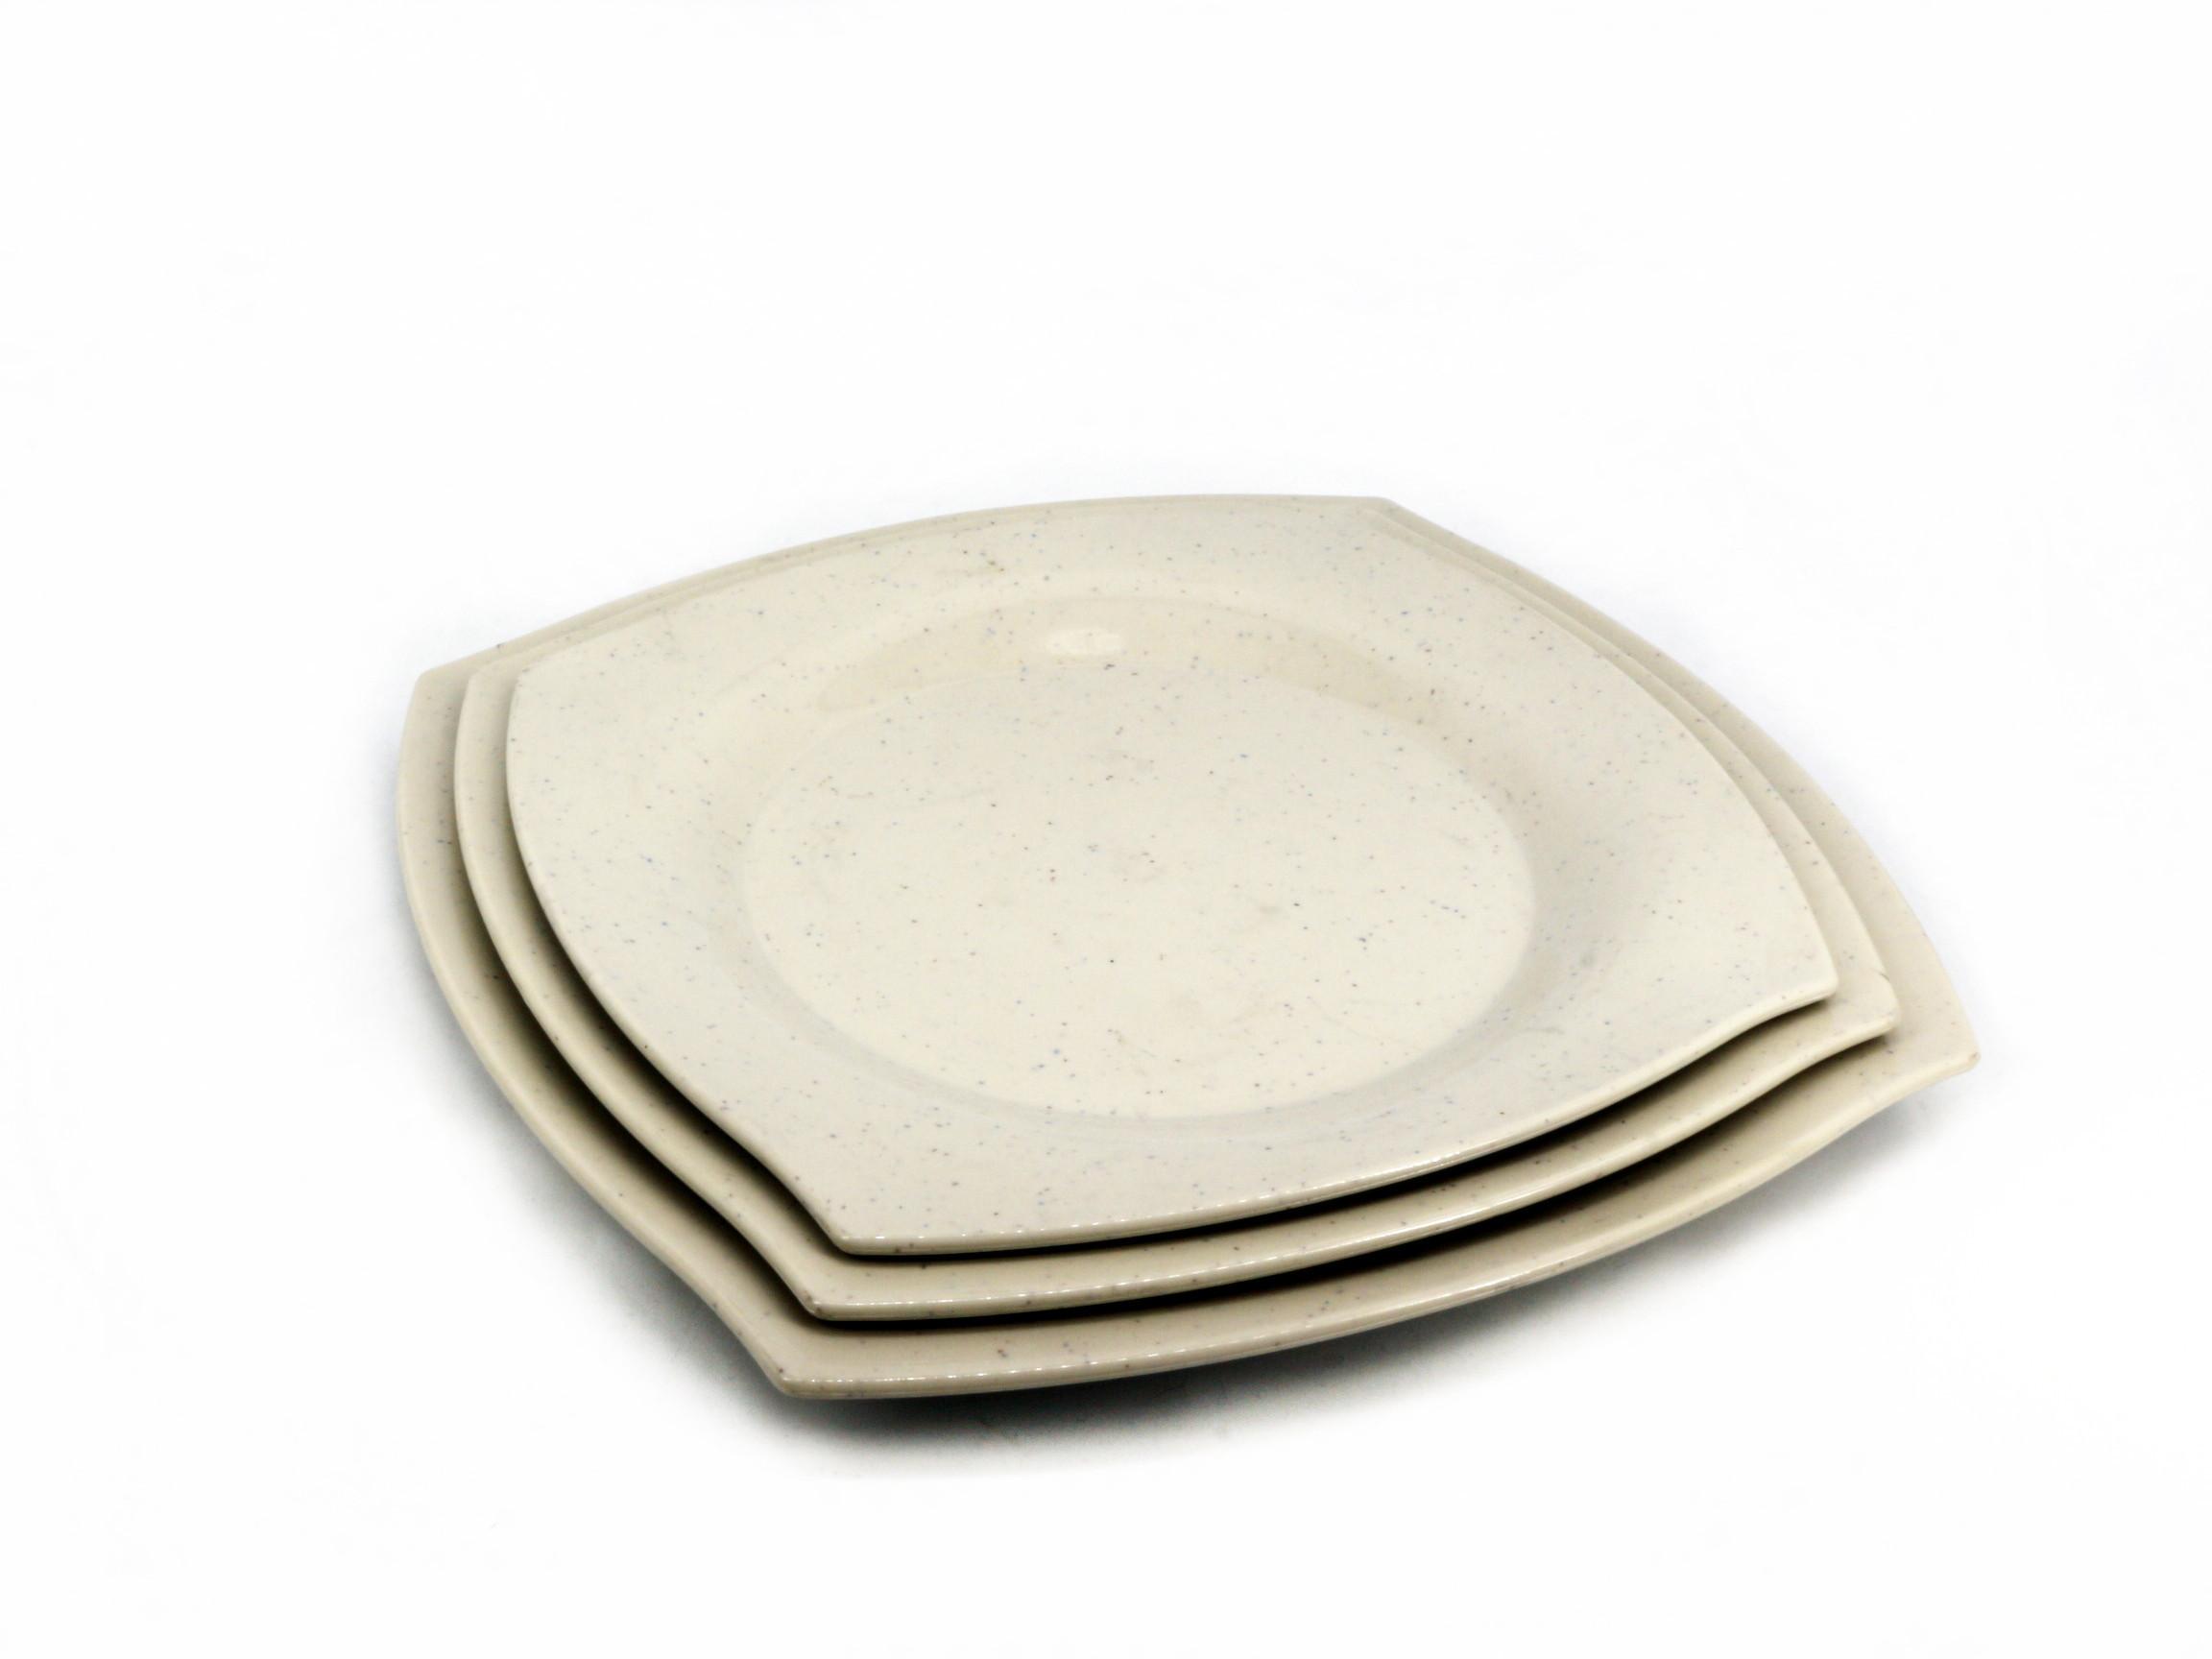 Toyogo Dining plate set A of 3 / piring 3 dalam 1 (27.8 x 27.8 cm, 25,0 x 25,0 cm, 23.0 x 23.0 cm)